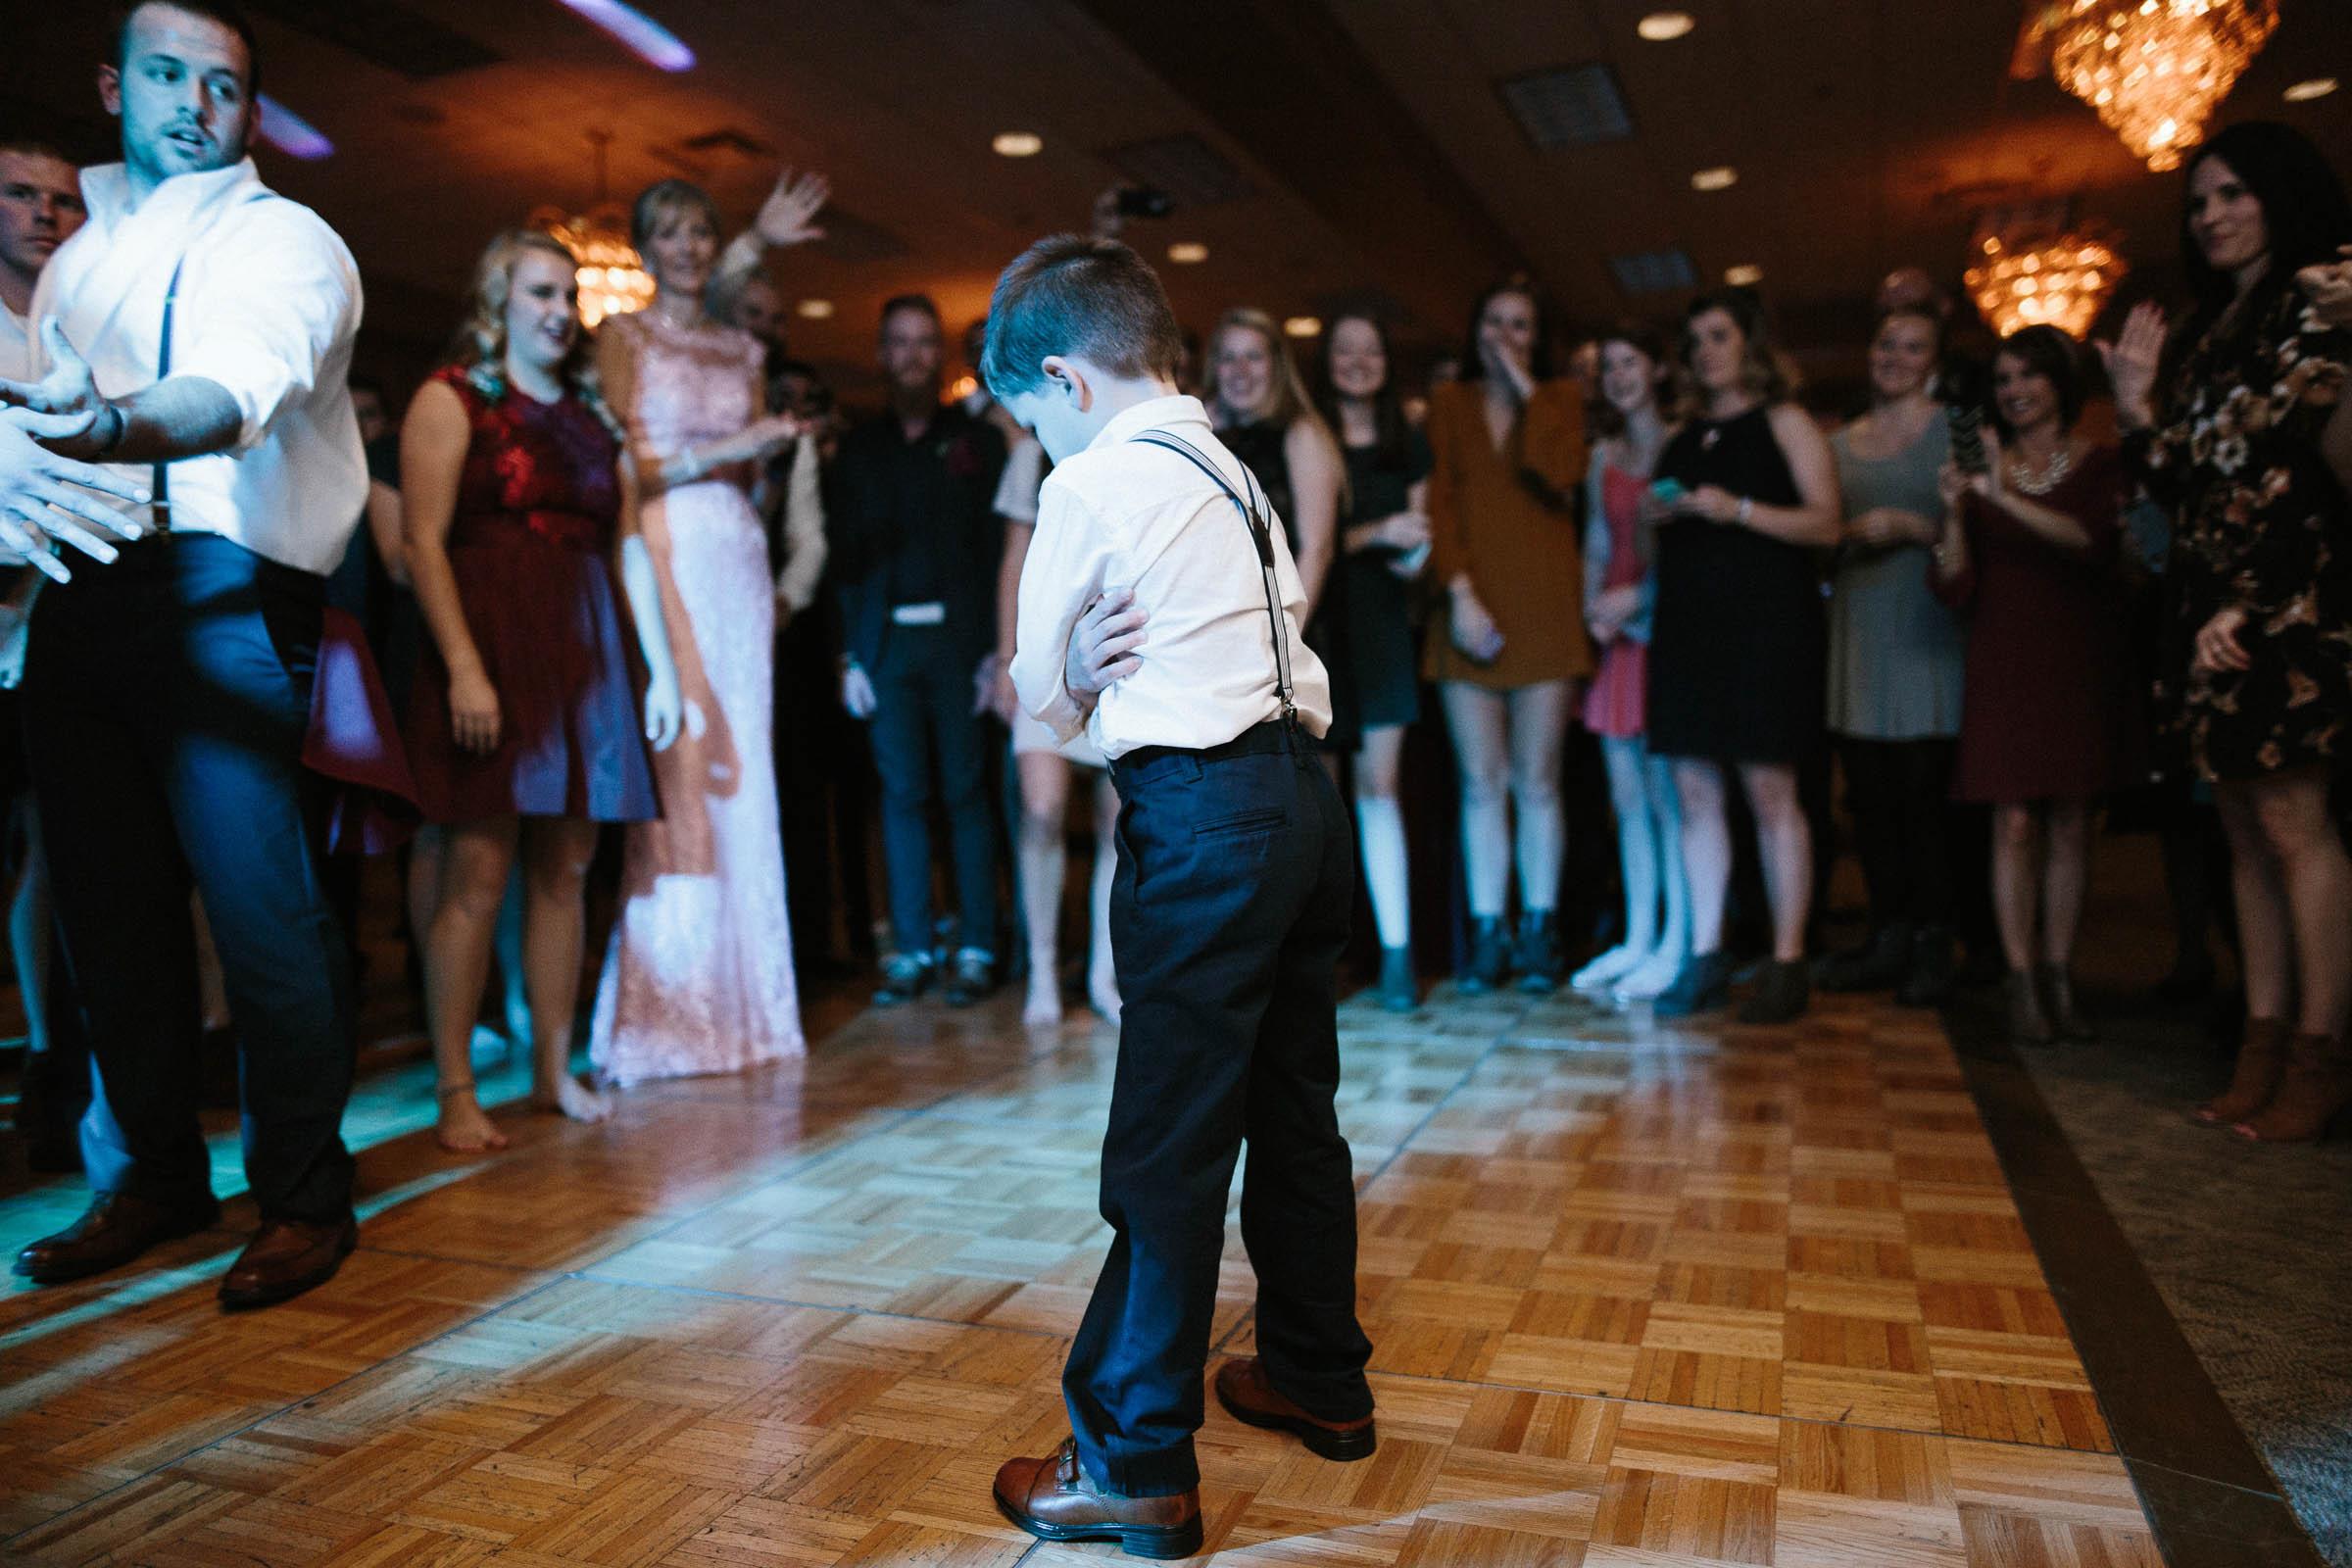 Jenna&Austin_SiouxFalls_Wedding_Photographer_122.jpg